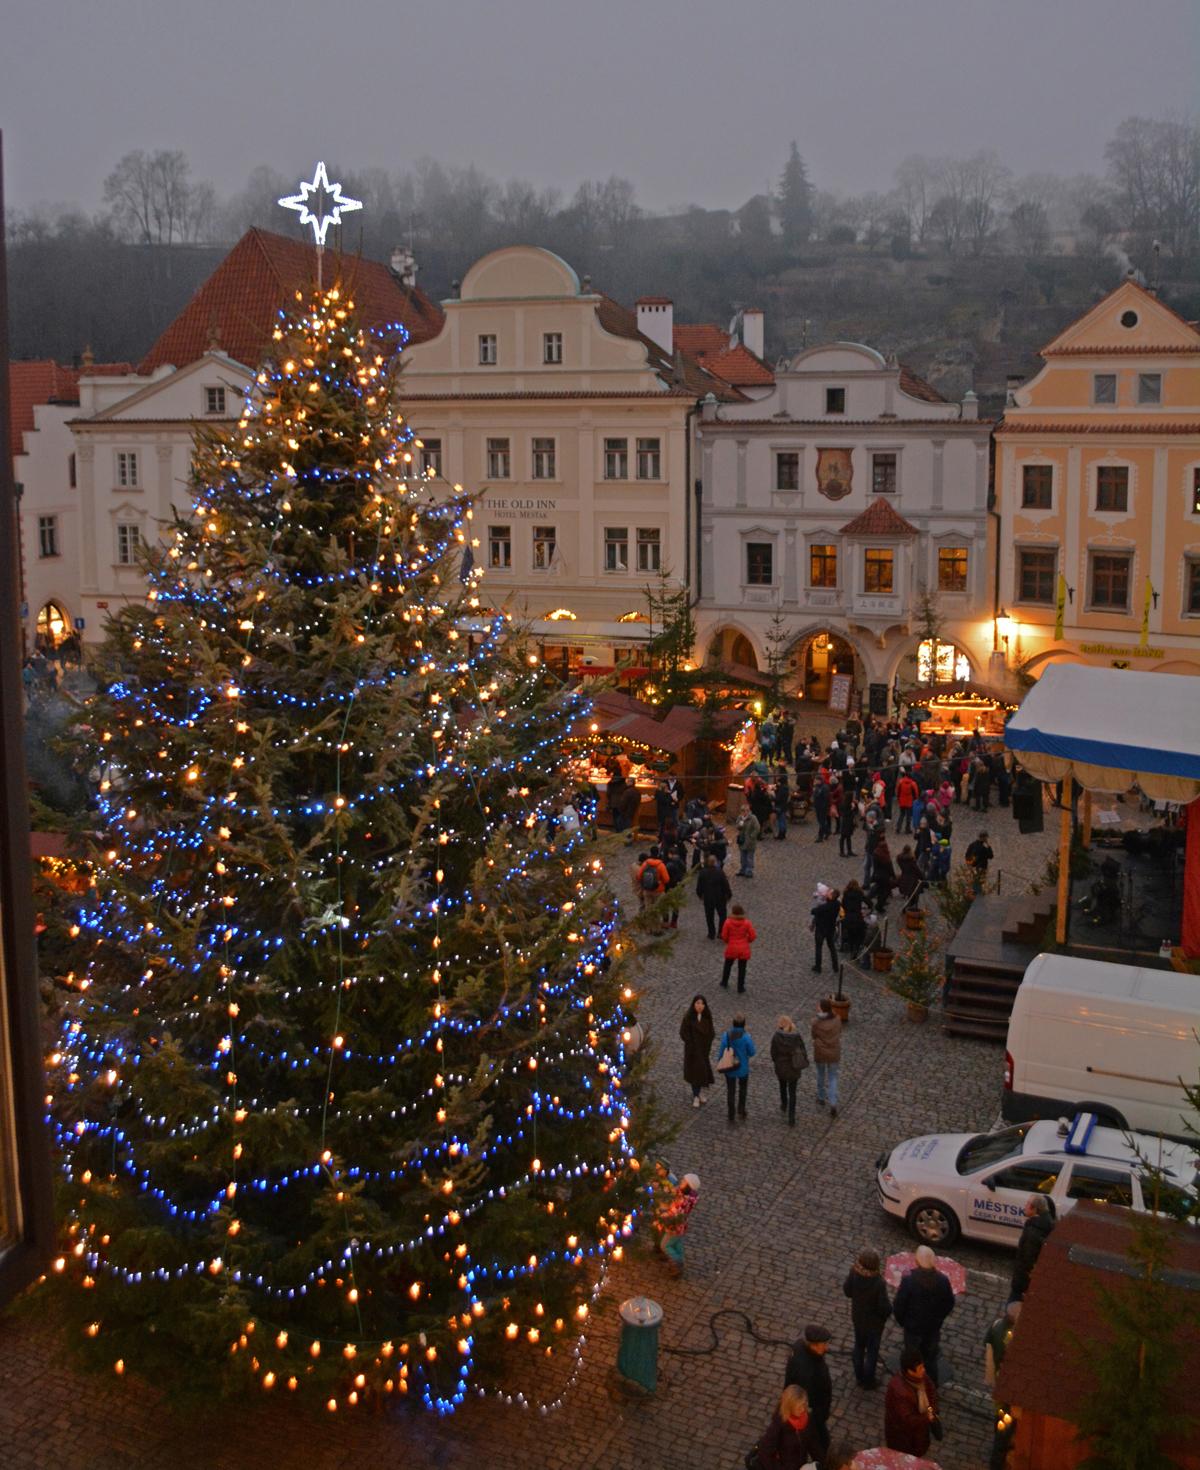 Cesky Krumlov Christmas Market in an Old World Mountain Village